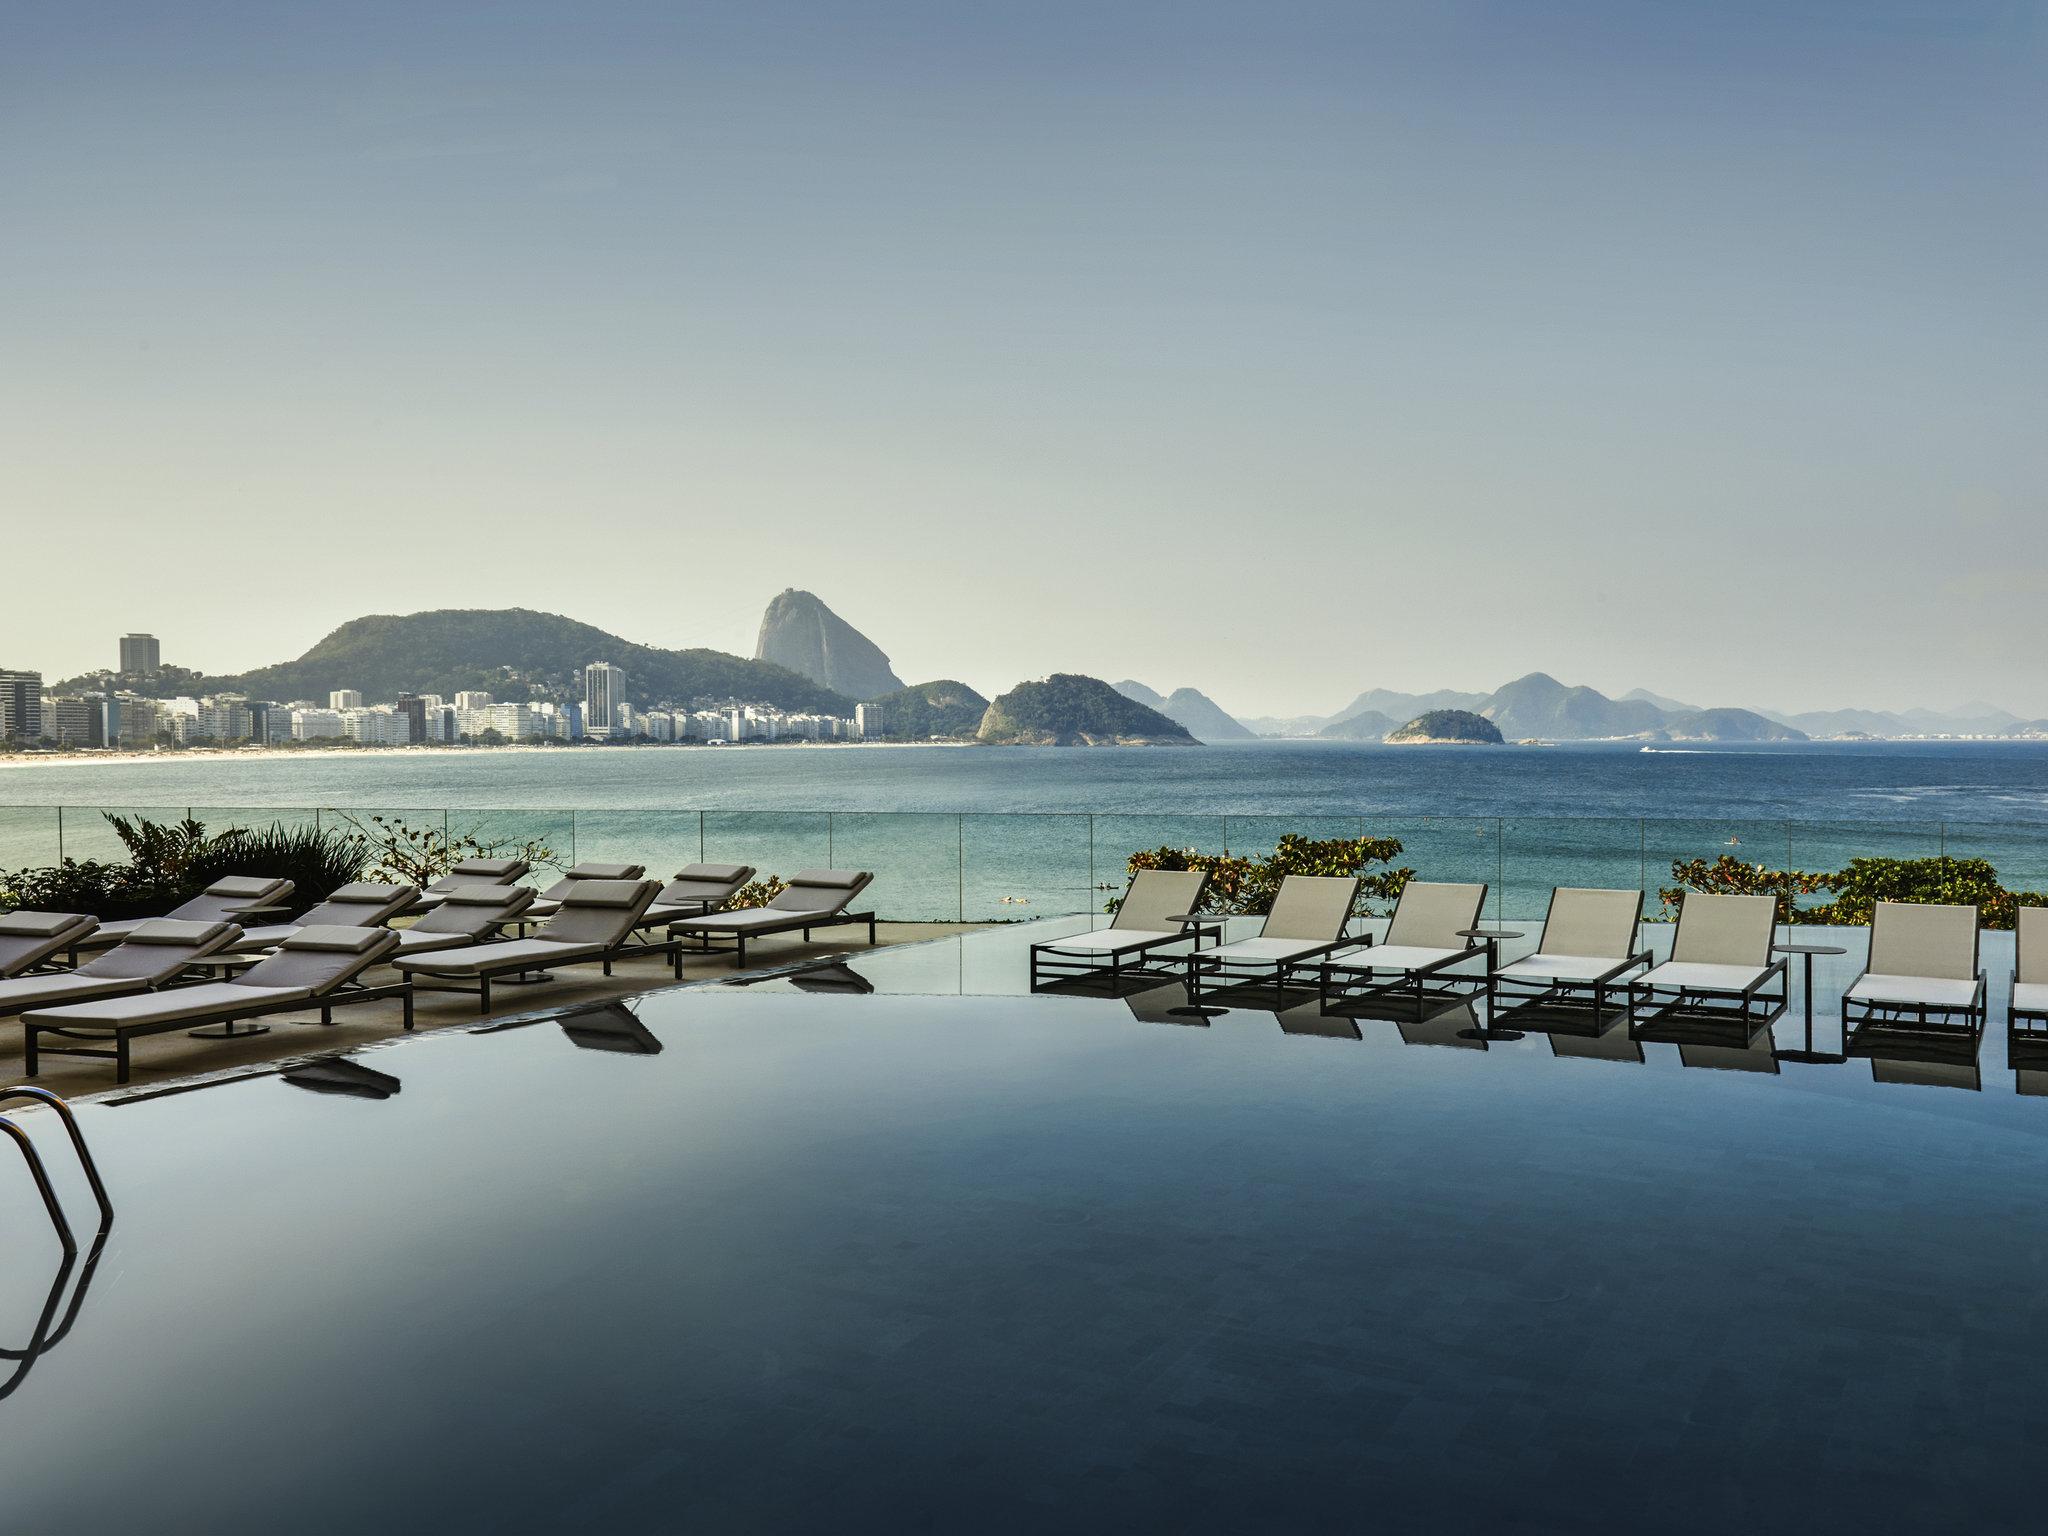 Hotel – Fairmon Rio Copacabana (tutup untuk renovasi)